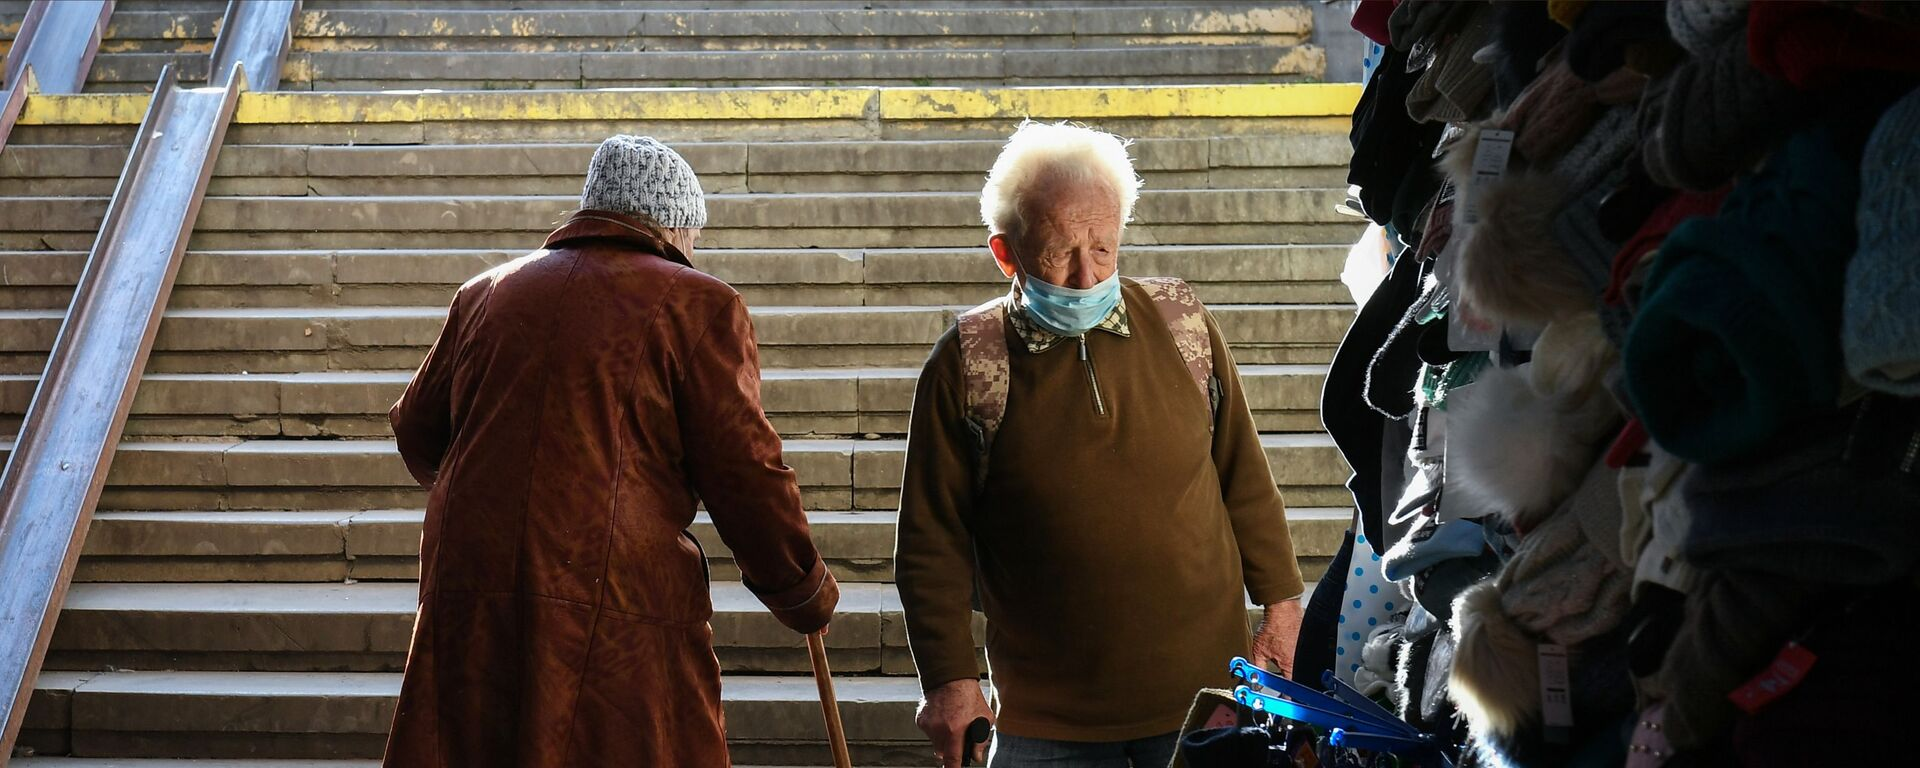 Seniorzy na schodach - Sputnik Polska, 1920, 14.03.2021